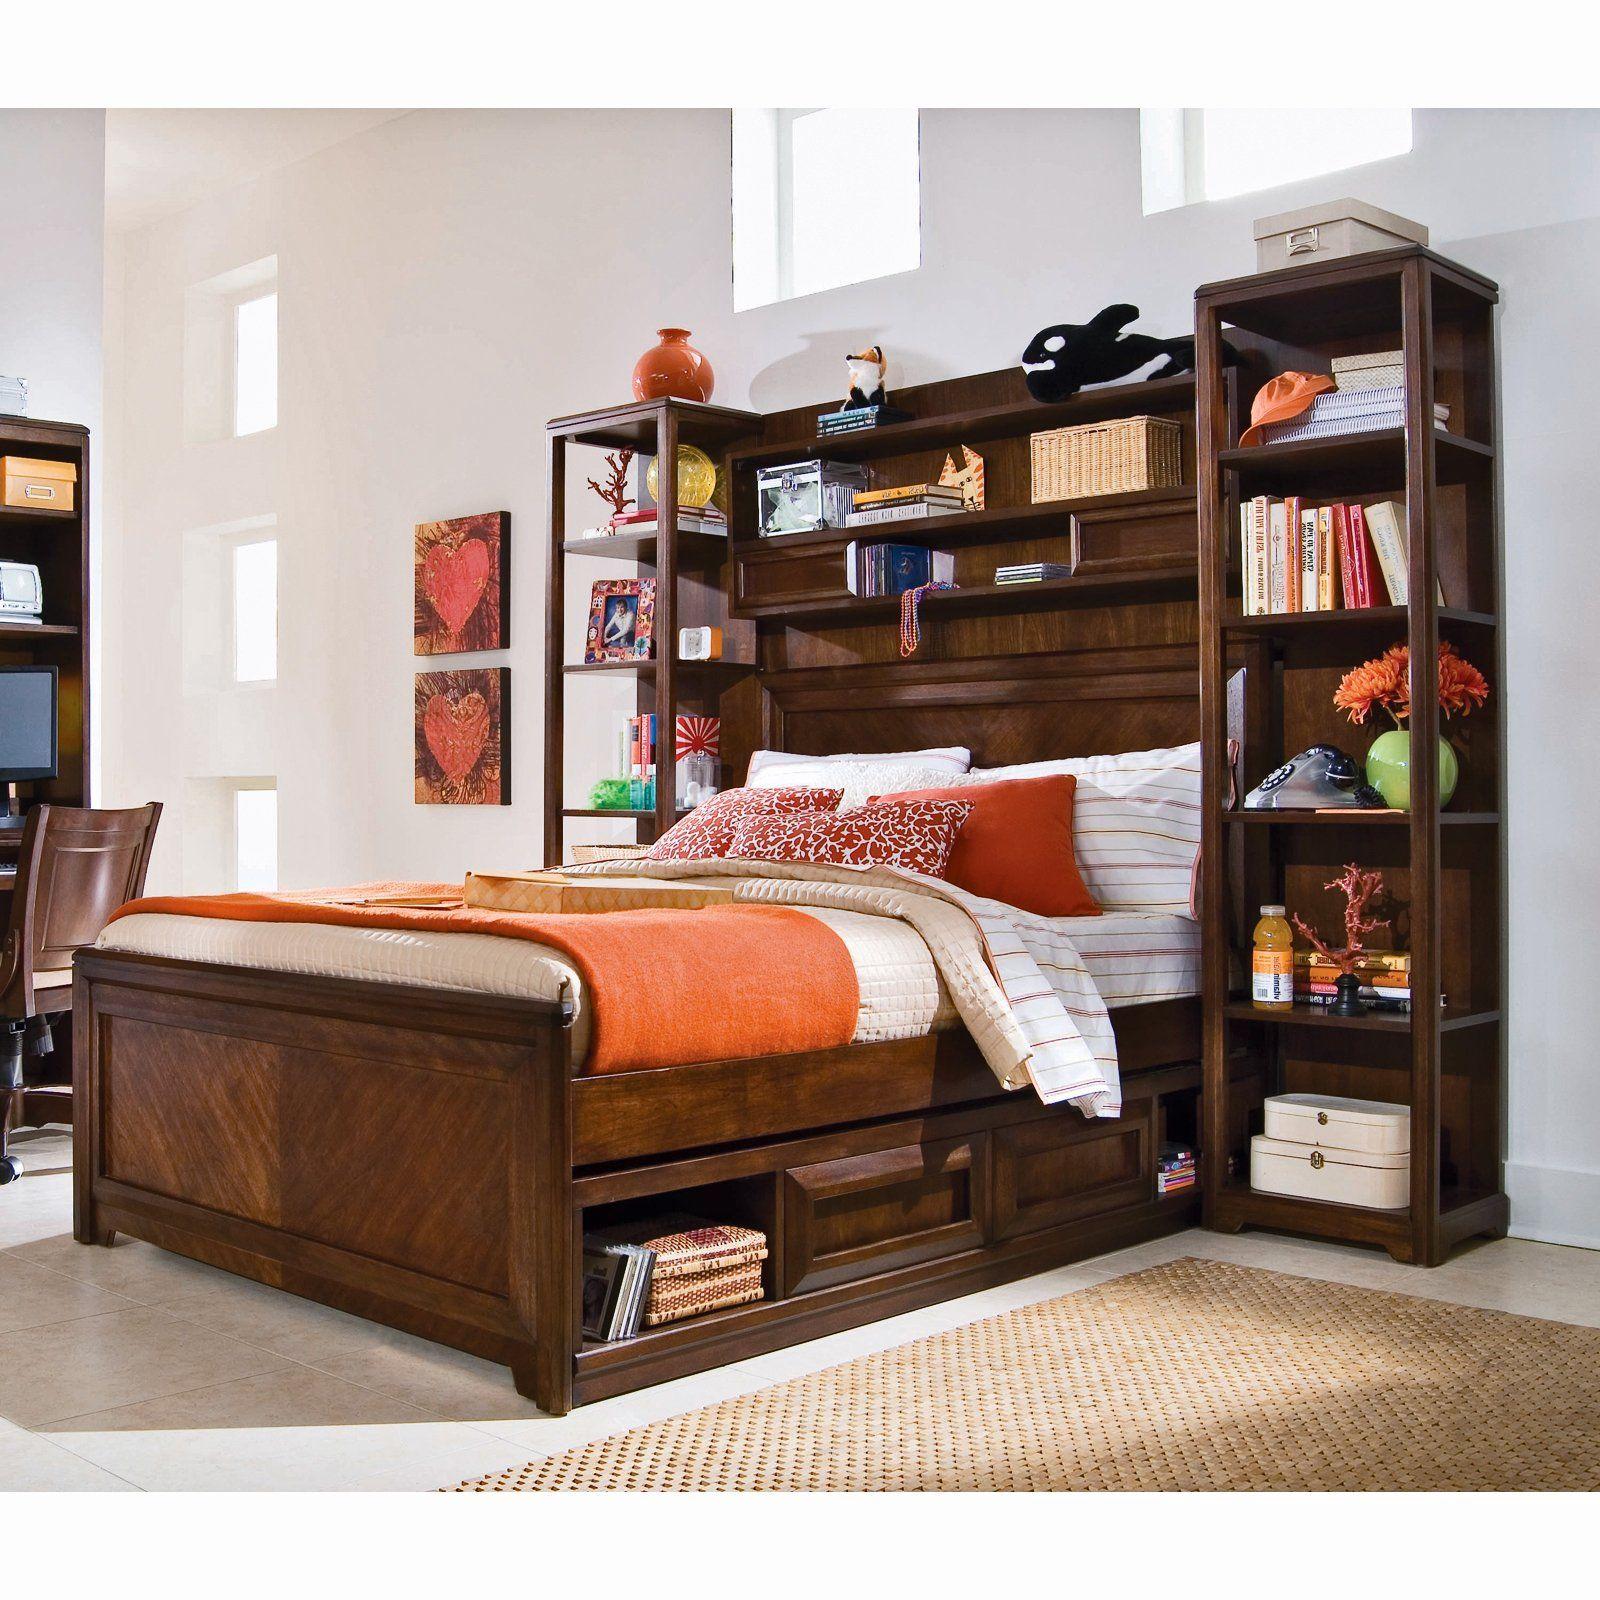 Bookcase Bed Bookcase bed, Modern kids bedroom